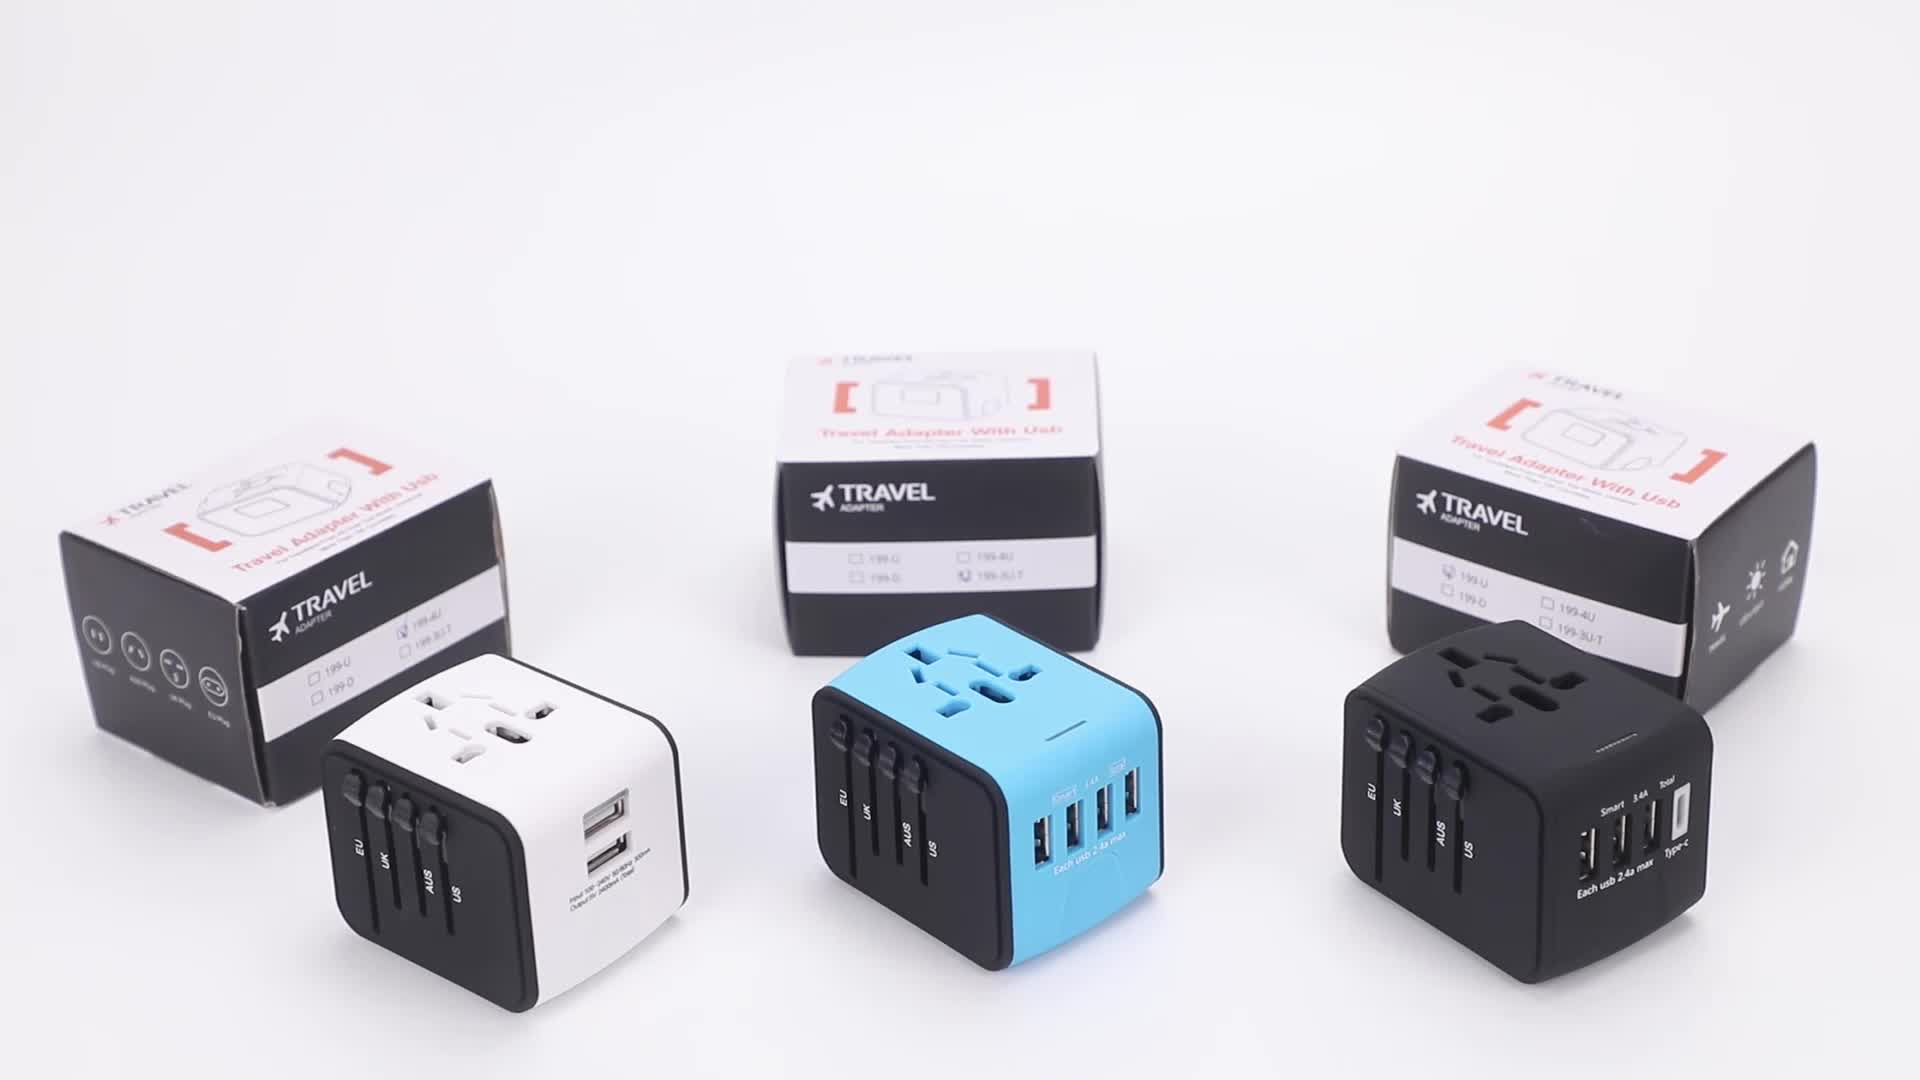 4 in 1 adapter travel Universal power adapter travel converter au eu uk adaptor plug dengan usb travel adapter